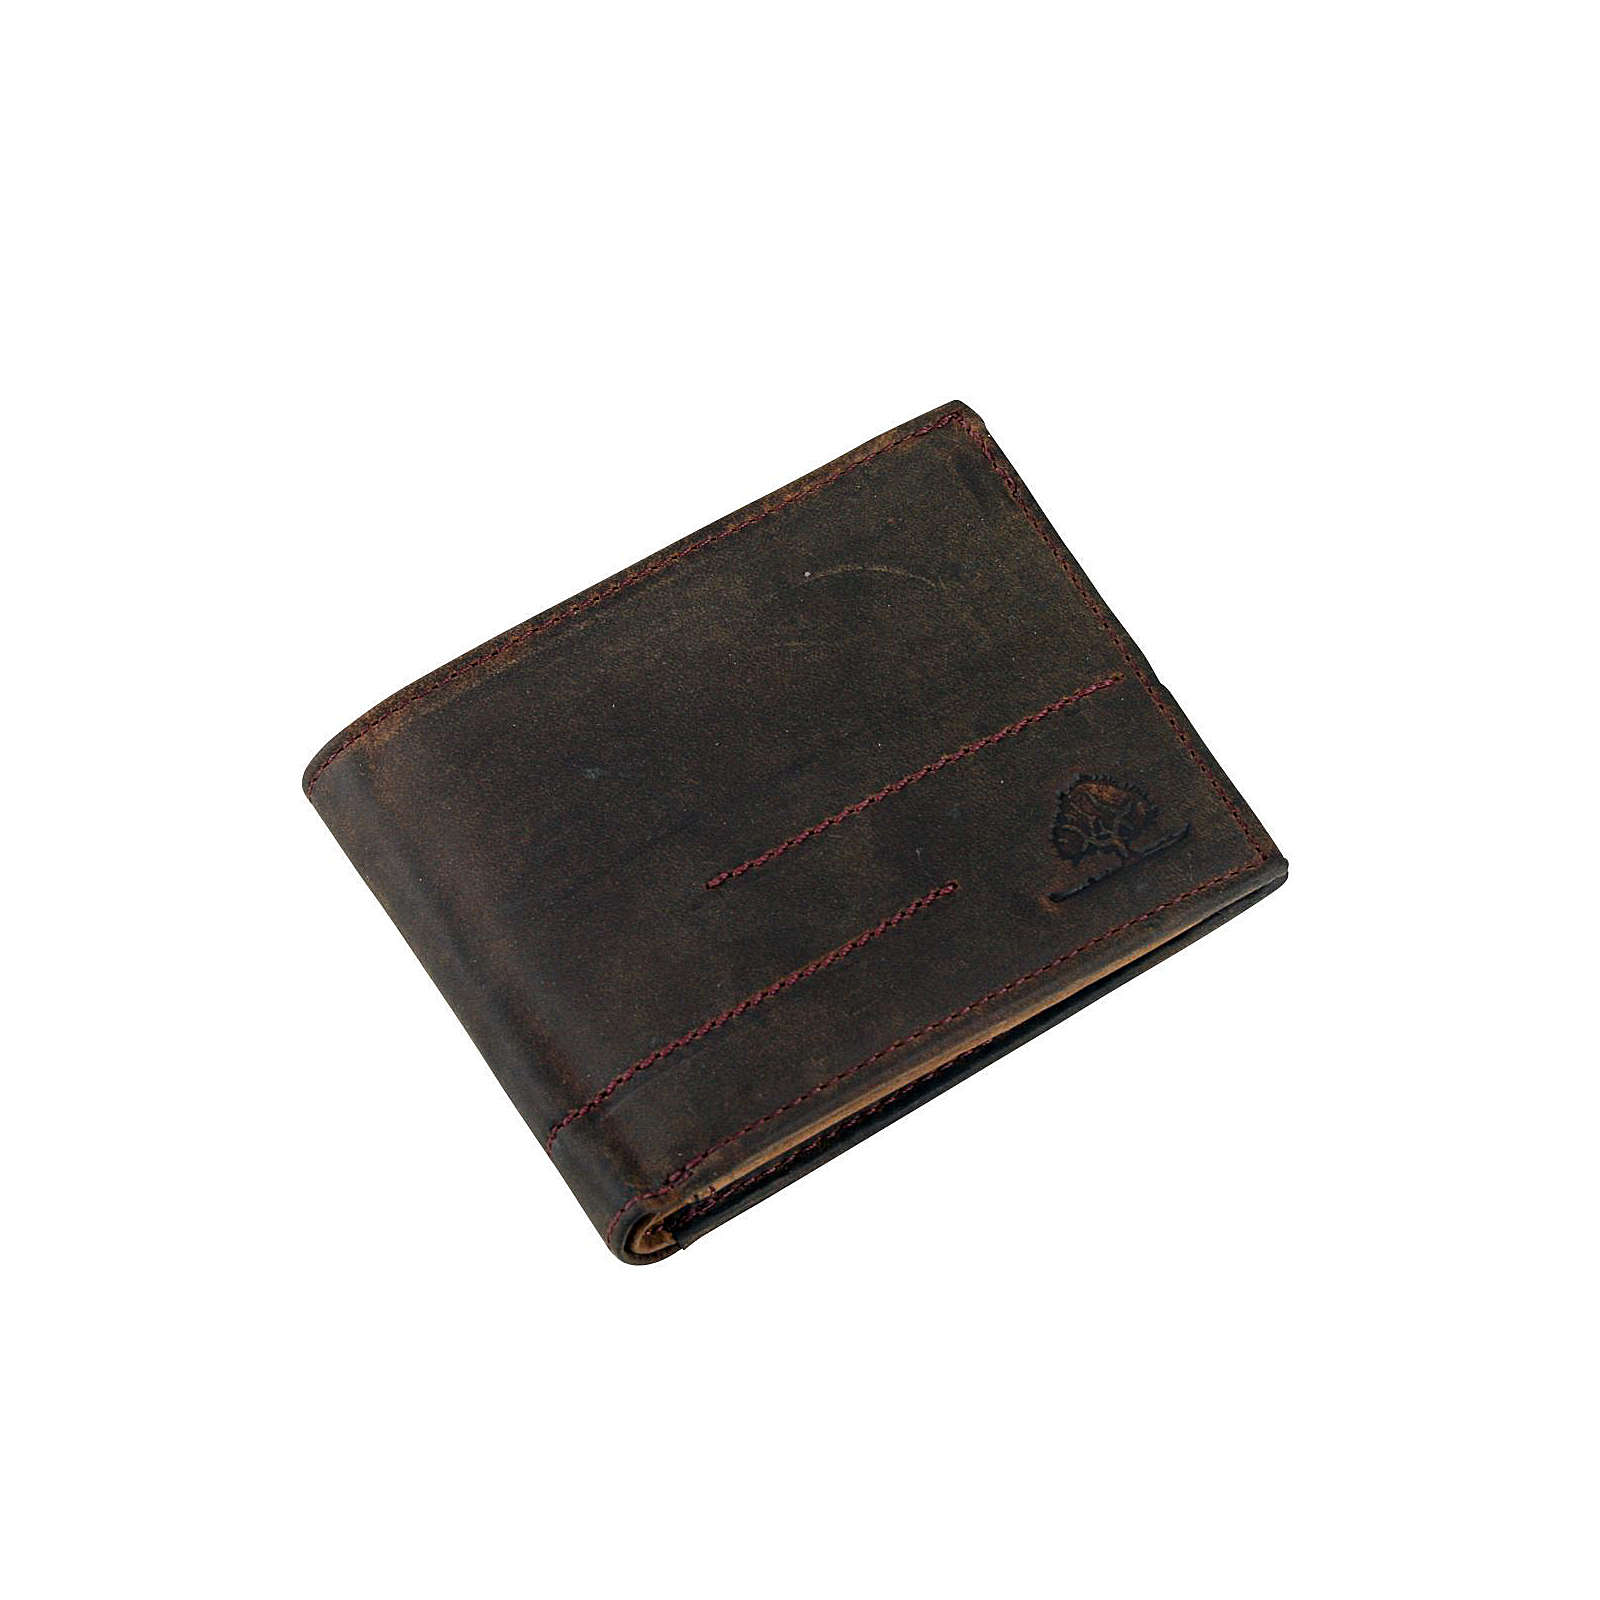 Greenburry Vintage Revival Vol.2 Geldbörse Leder 12 cm braun Herren